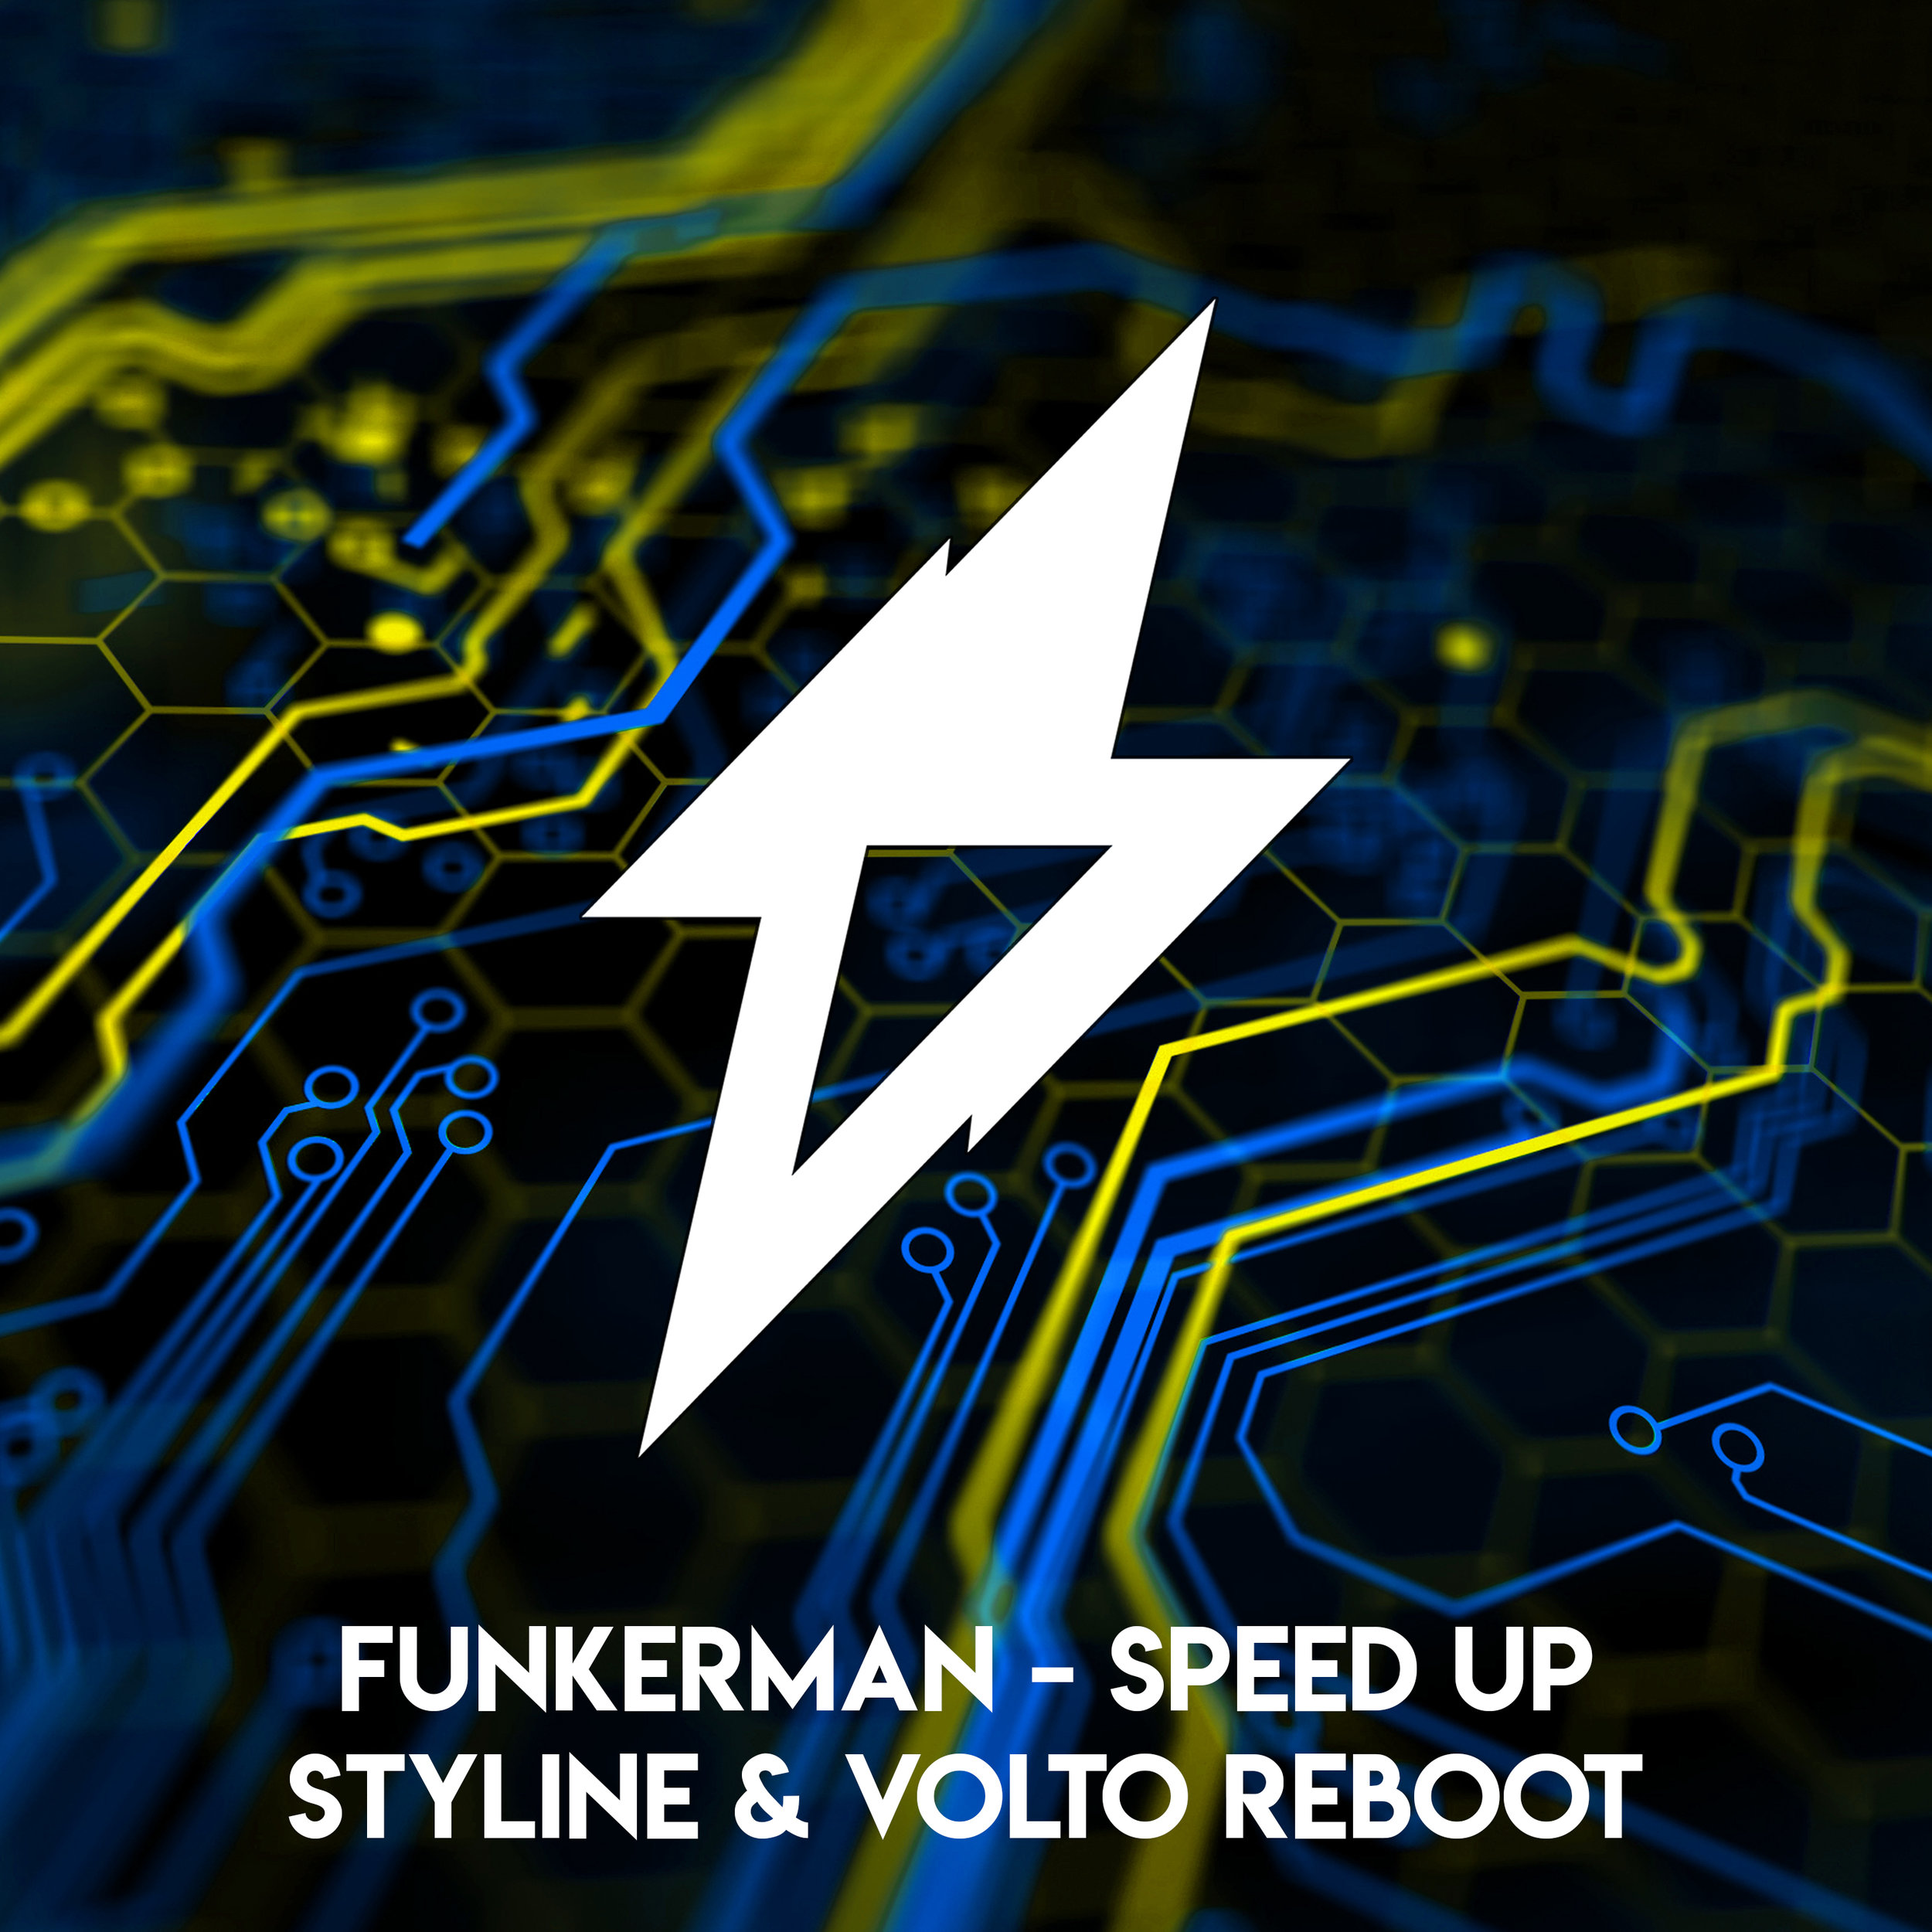 Funkerman - Speed Up (Styline & VOLTO Reboot).jpg